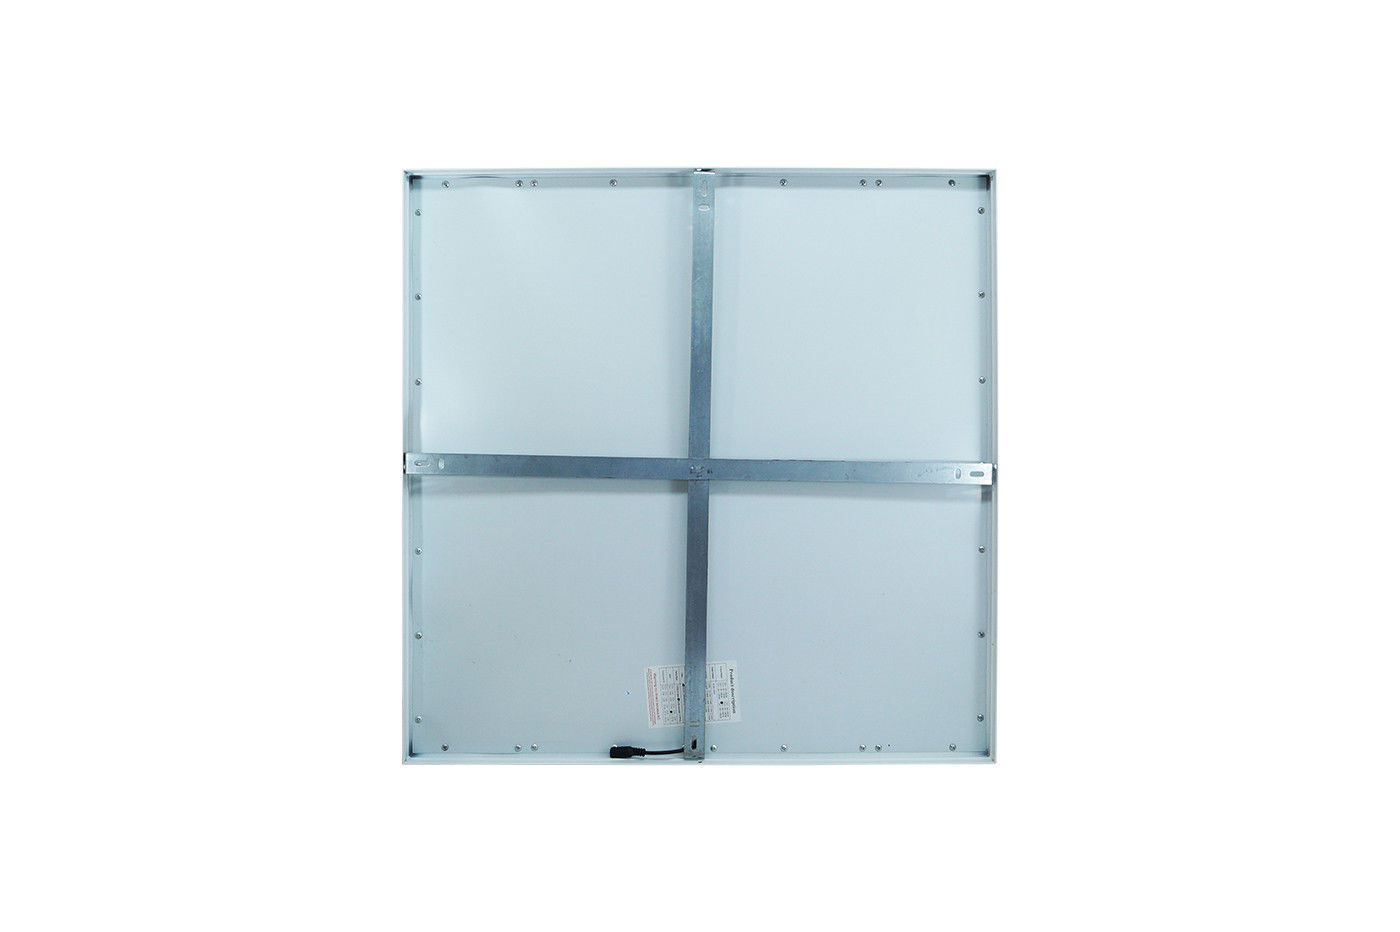 Plafoniere Quadrate Grandi : Bes plafoniere beselettronica pannello plafoniera led